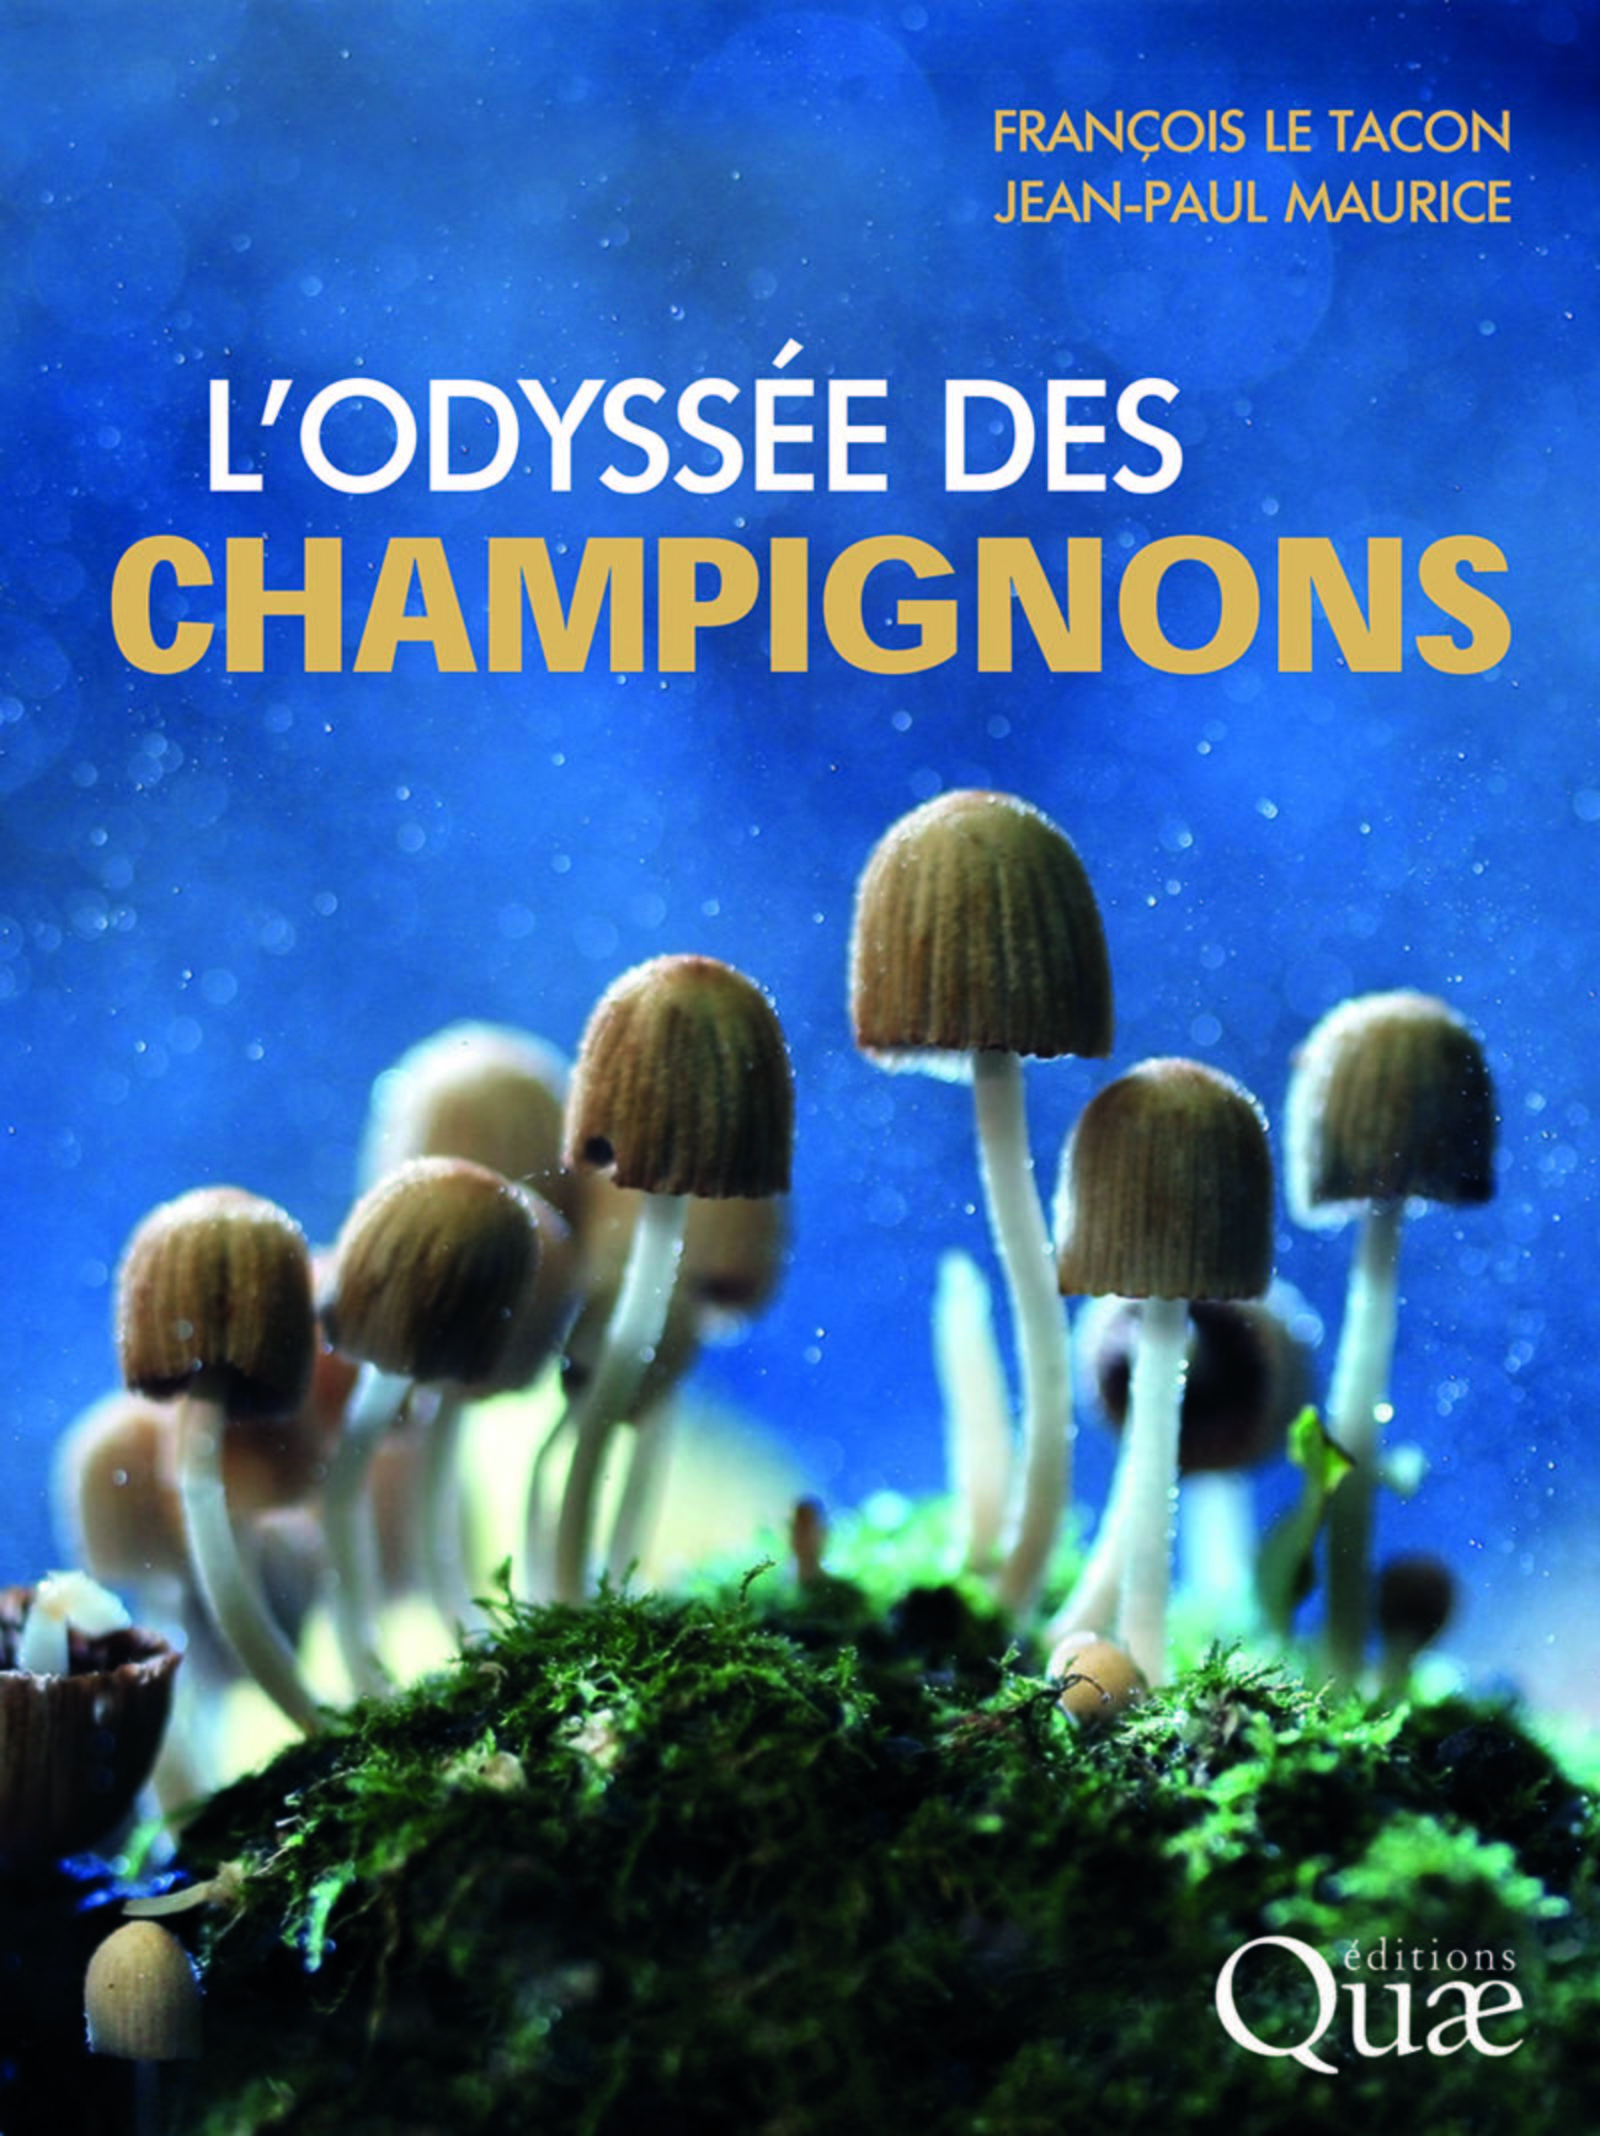 L'ODYSSEE DES CHAMPIGNONS